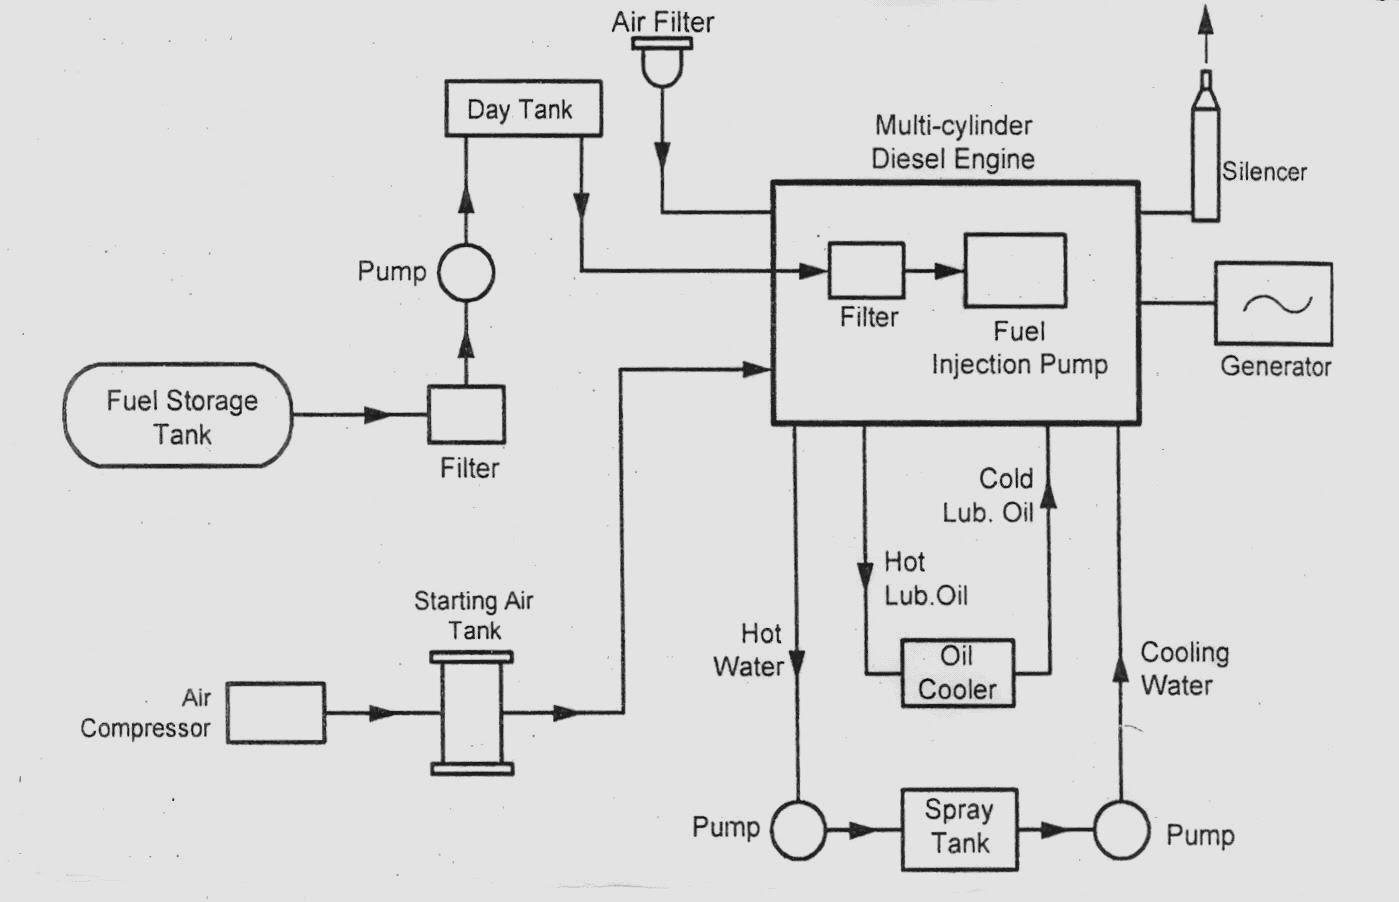 strike slip fault block diagram sink pipe nuclear power plant simple imageresizertool com